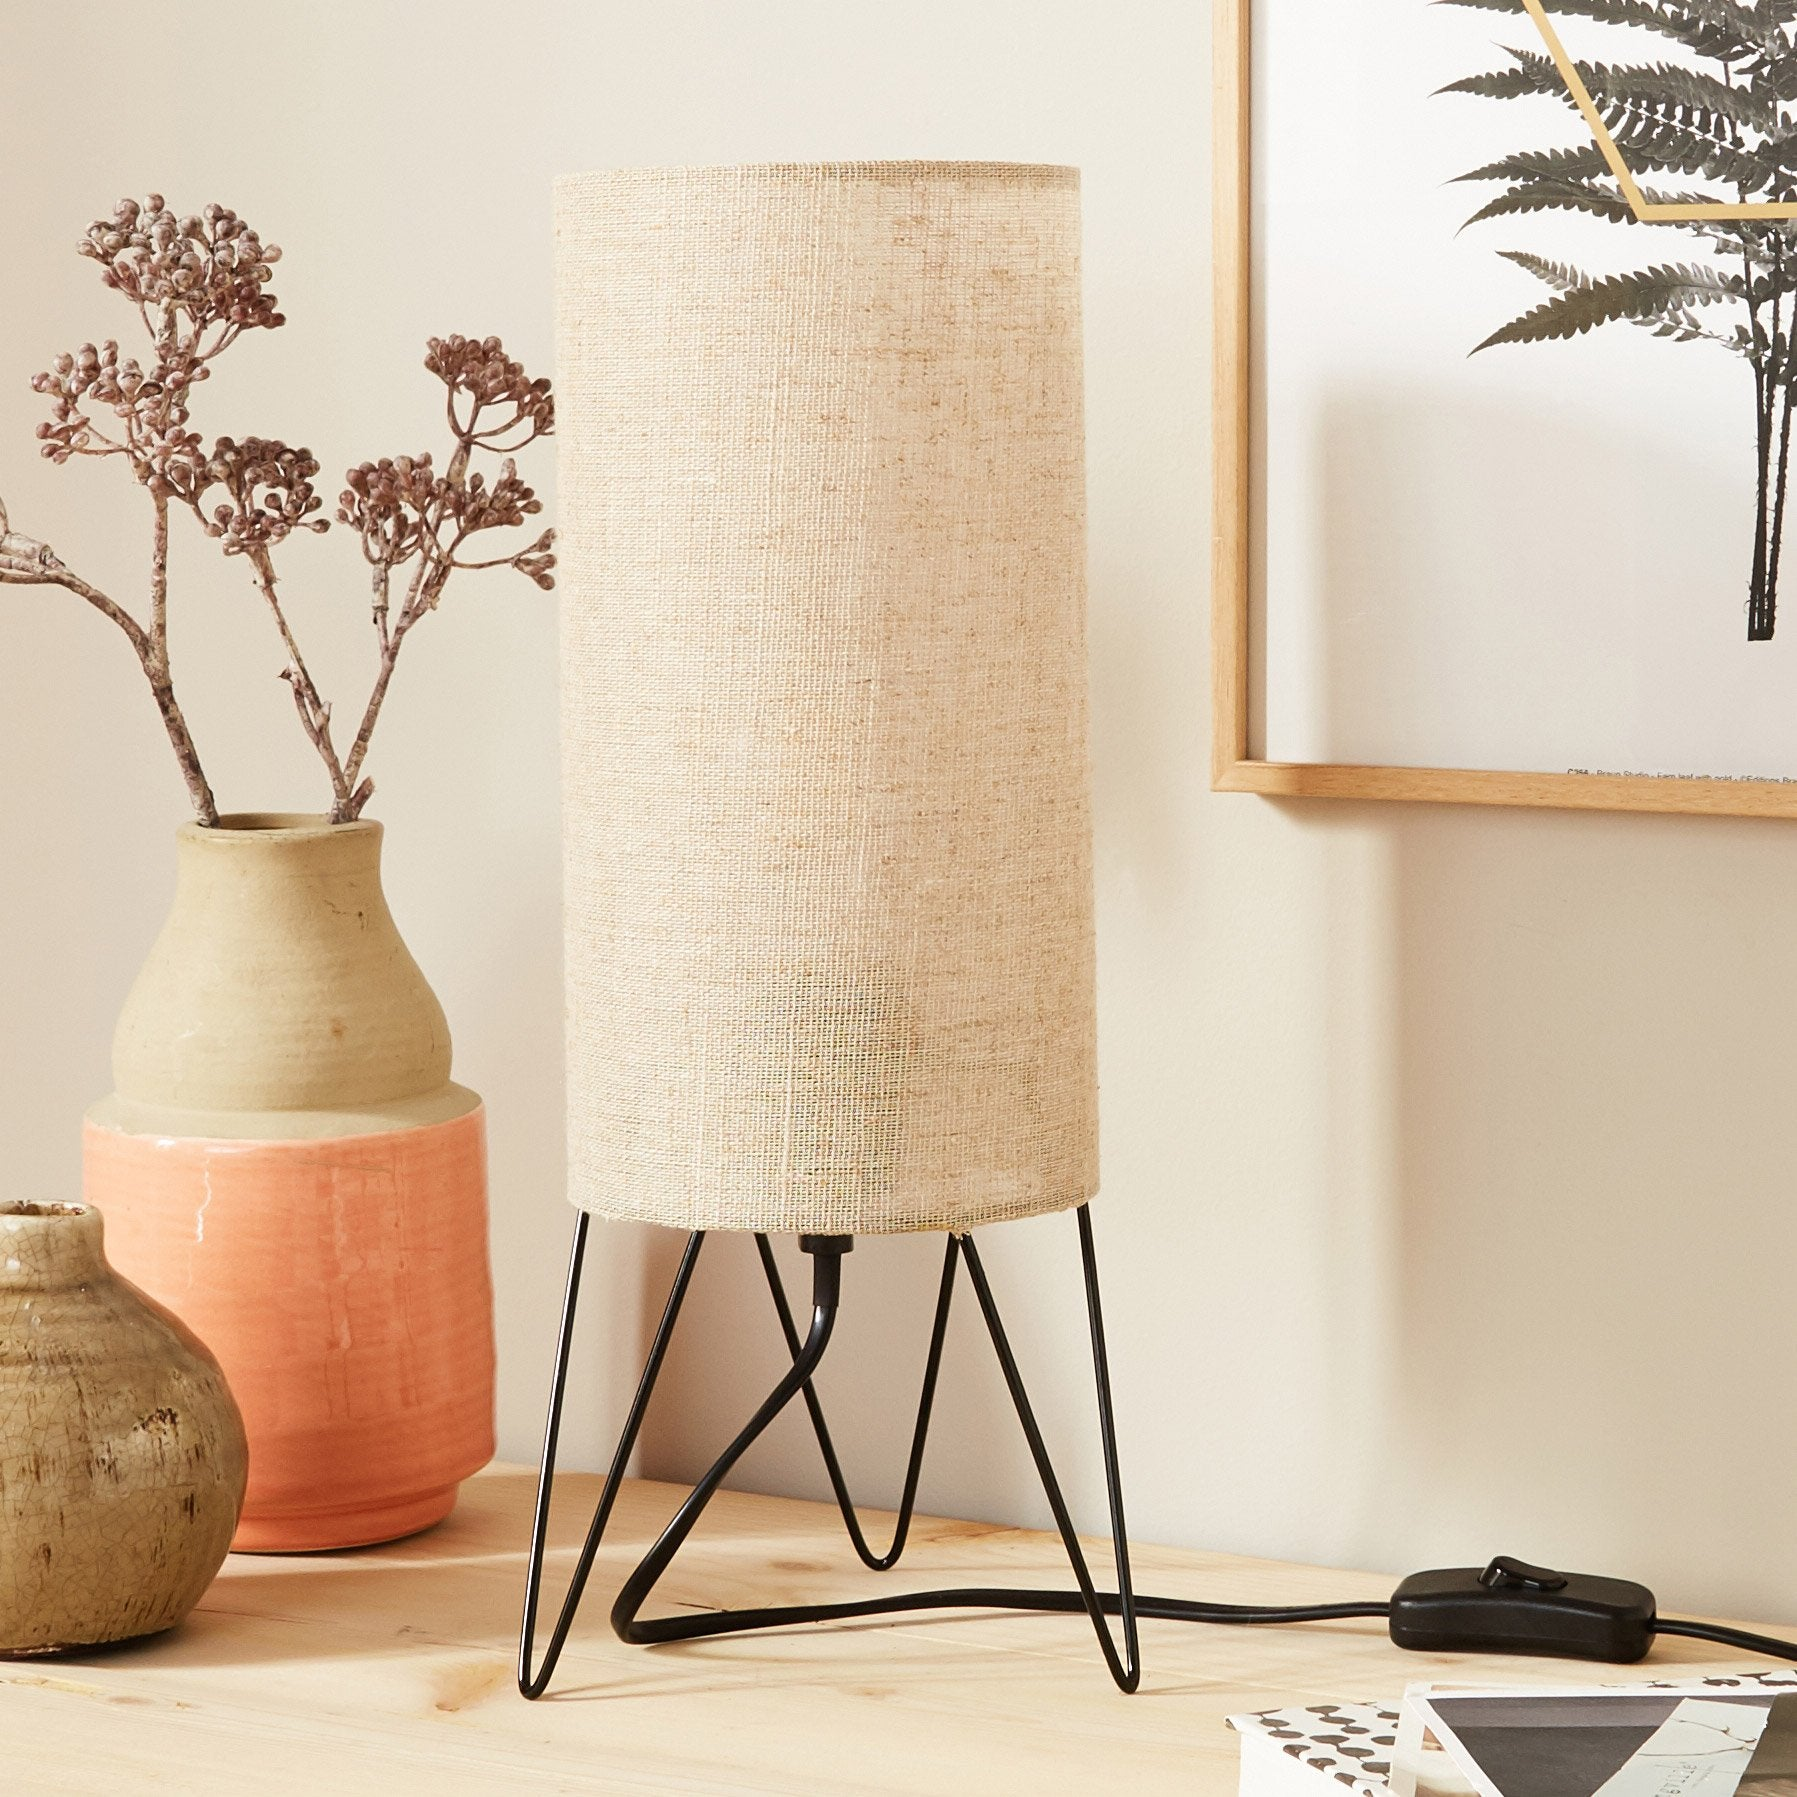 Lampe, moderne, métal jaune, INSPIRE Savanah 37 cm